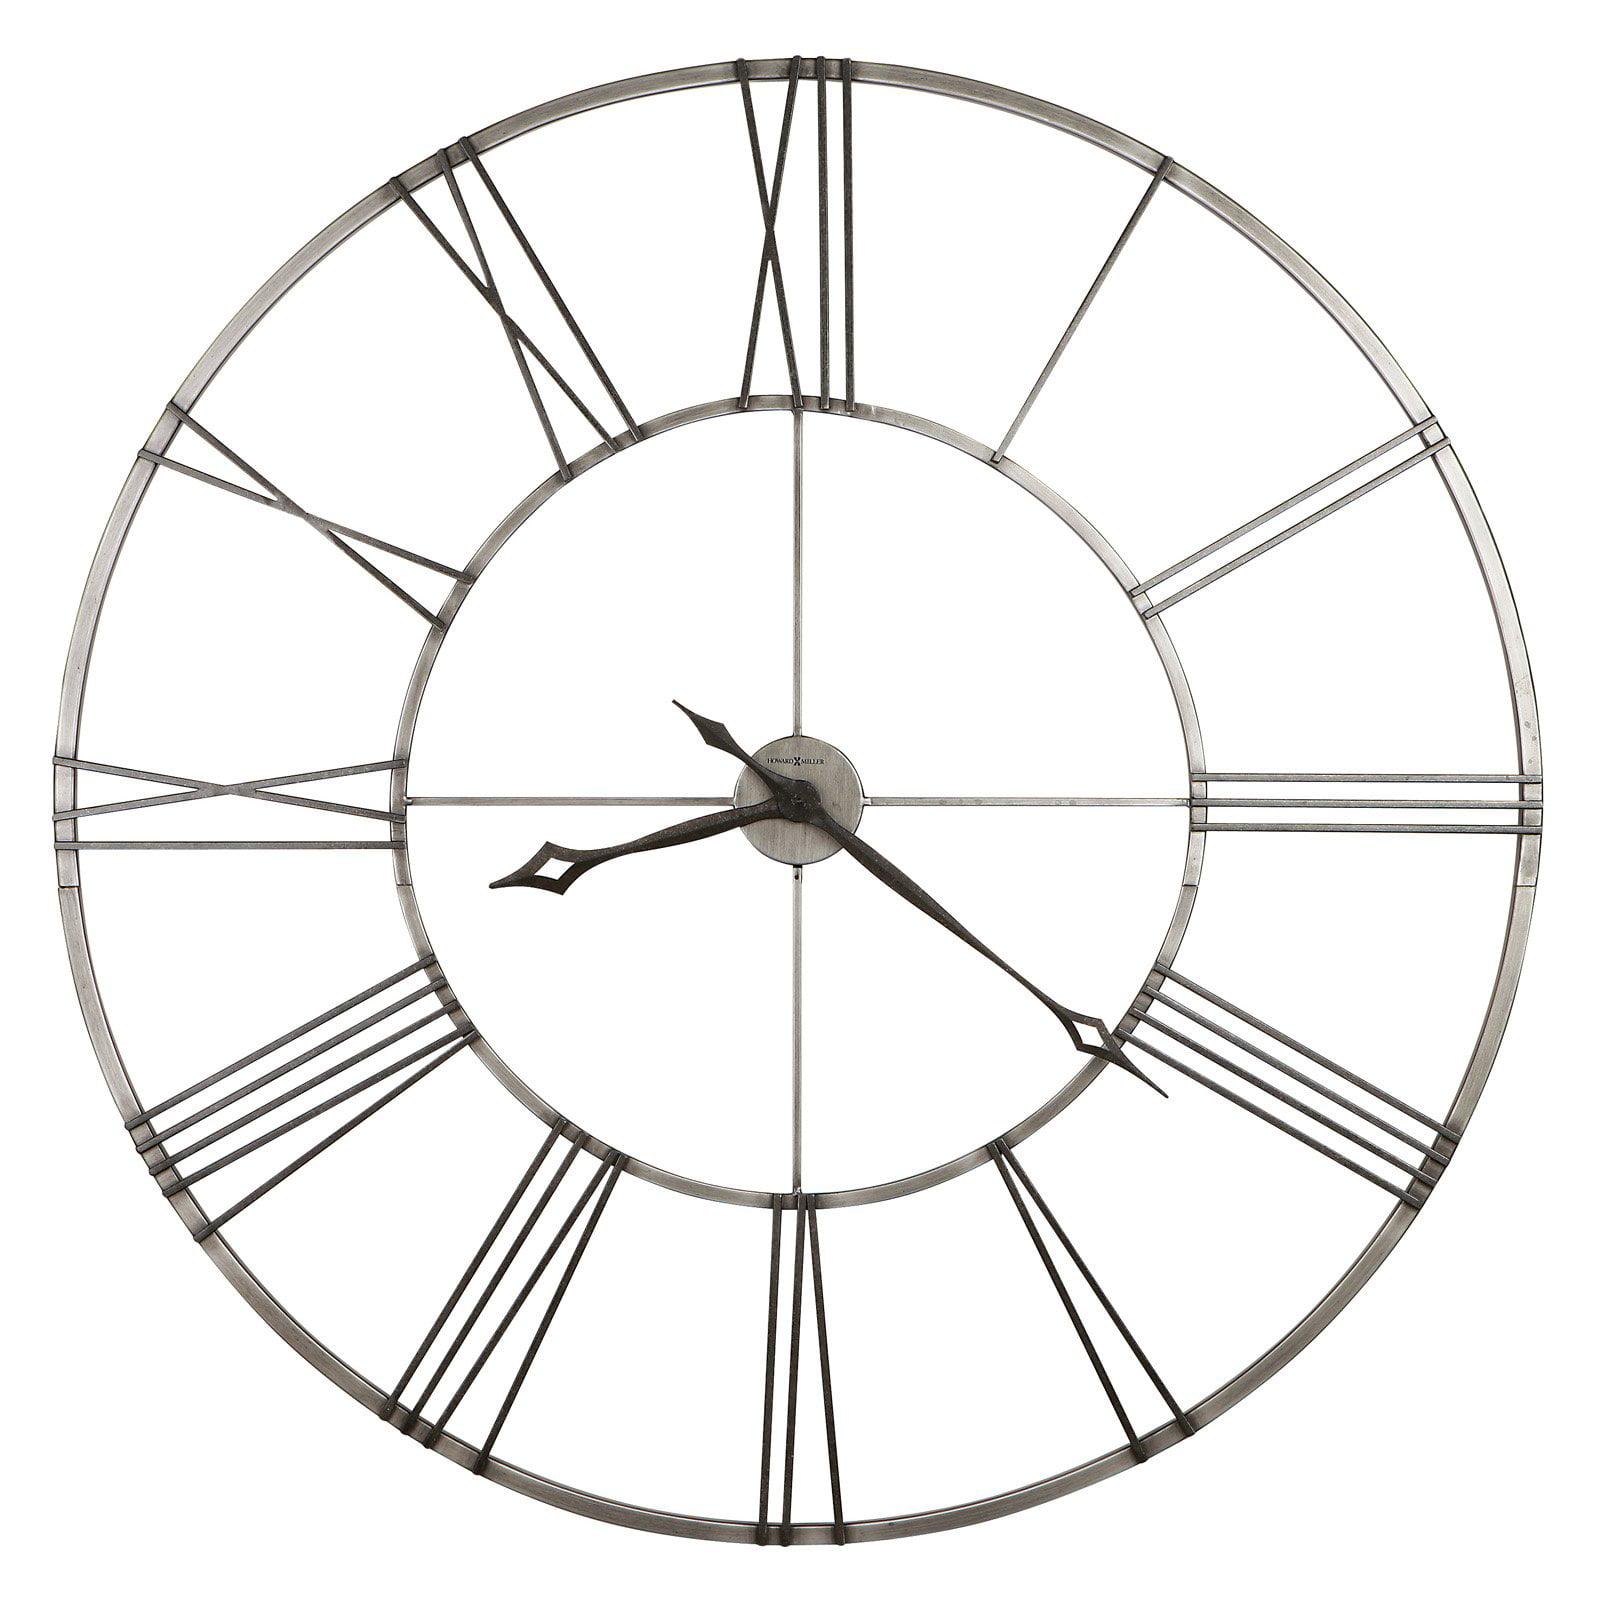 Howard Miller 625-472 Stockton 49-in. Wall Clock by Howard Miller